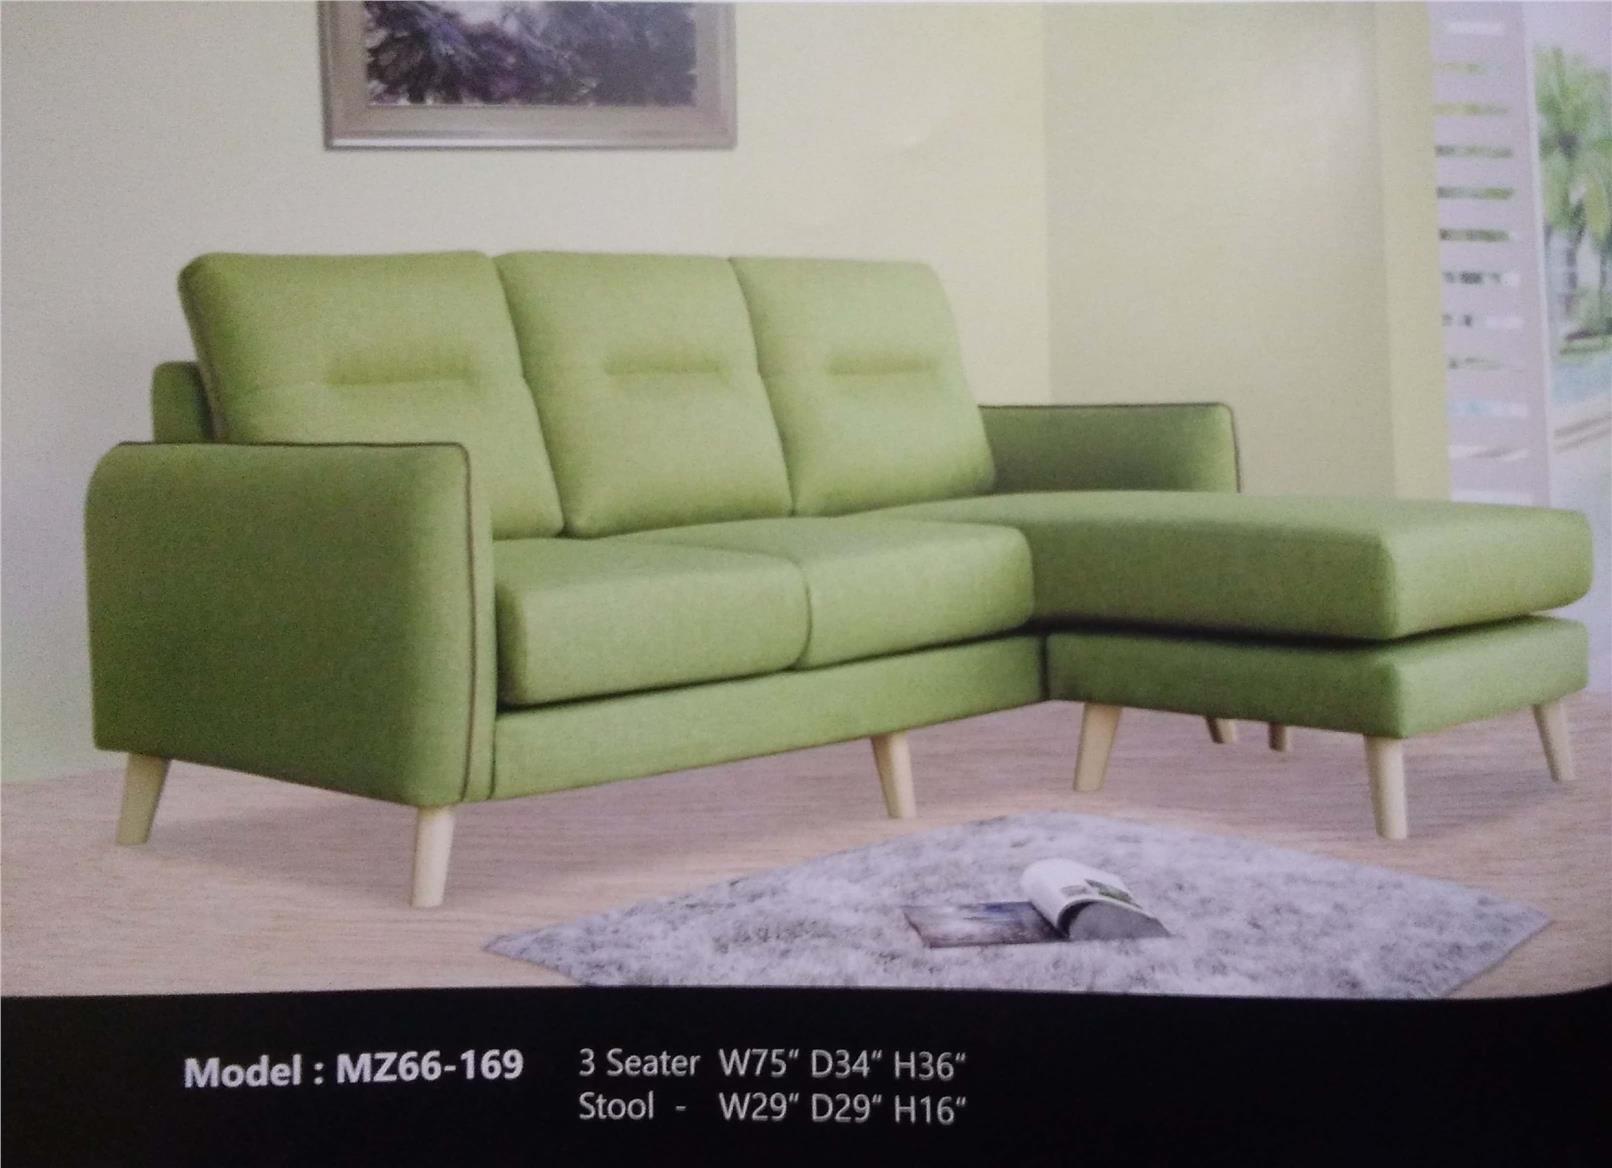 Sofa Bed Malaysia Murah Besten Bettsofa Design Ideen